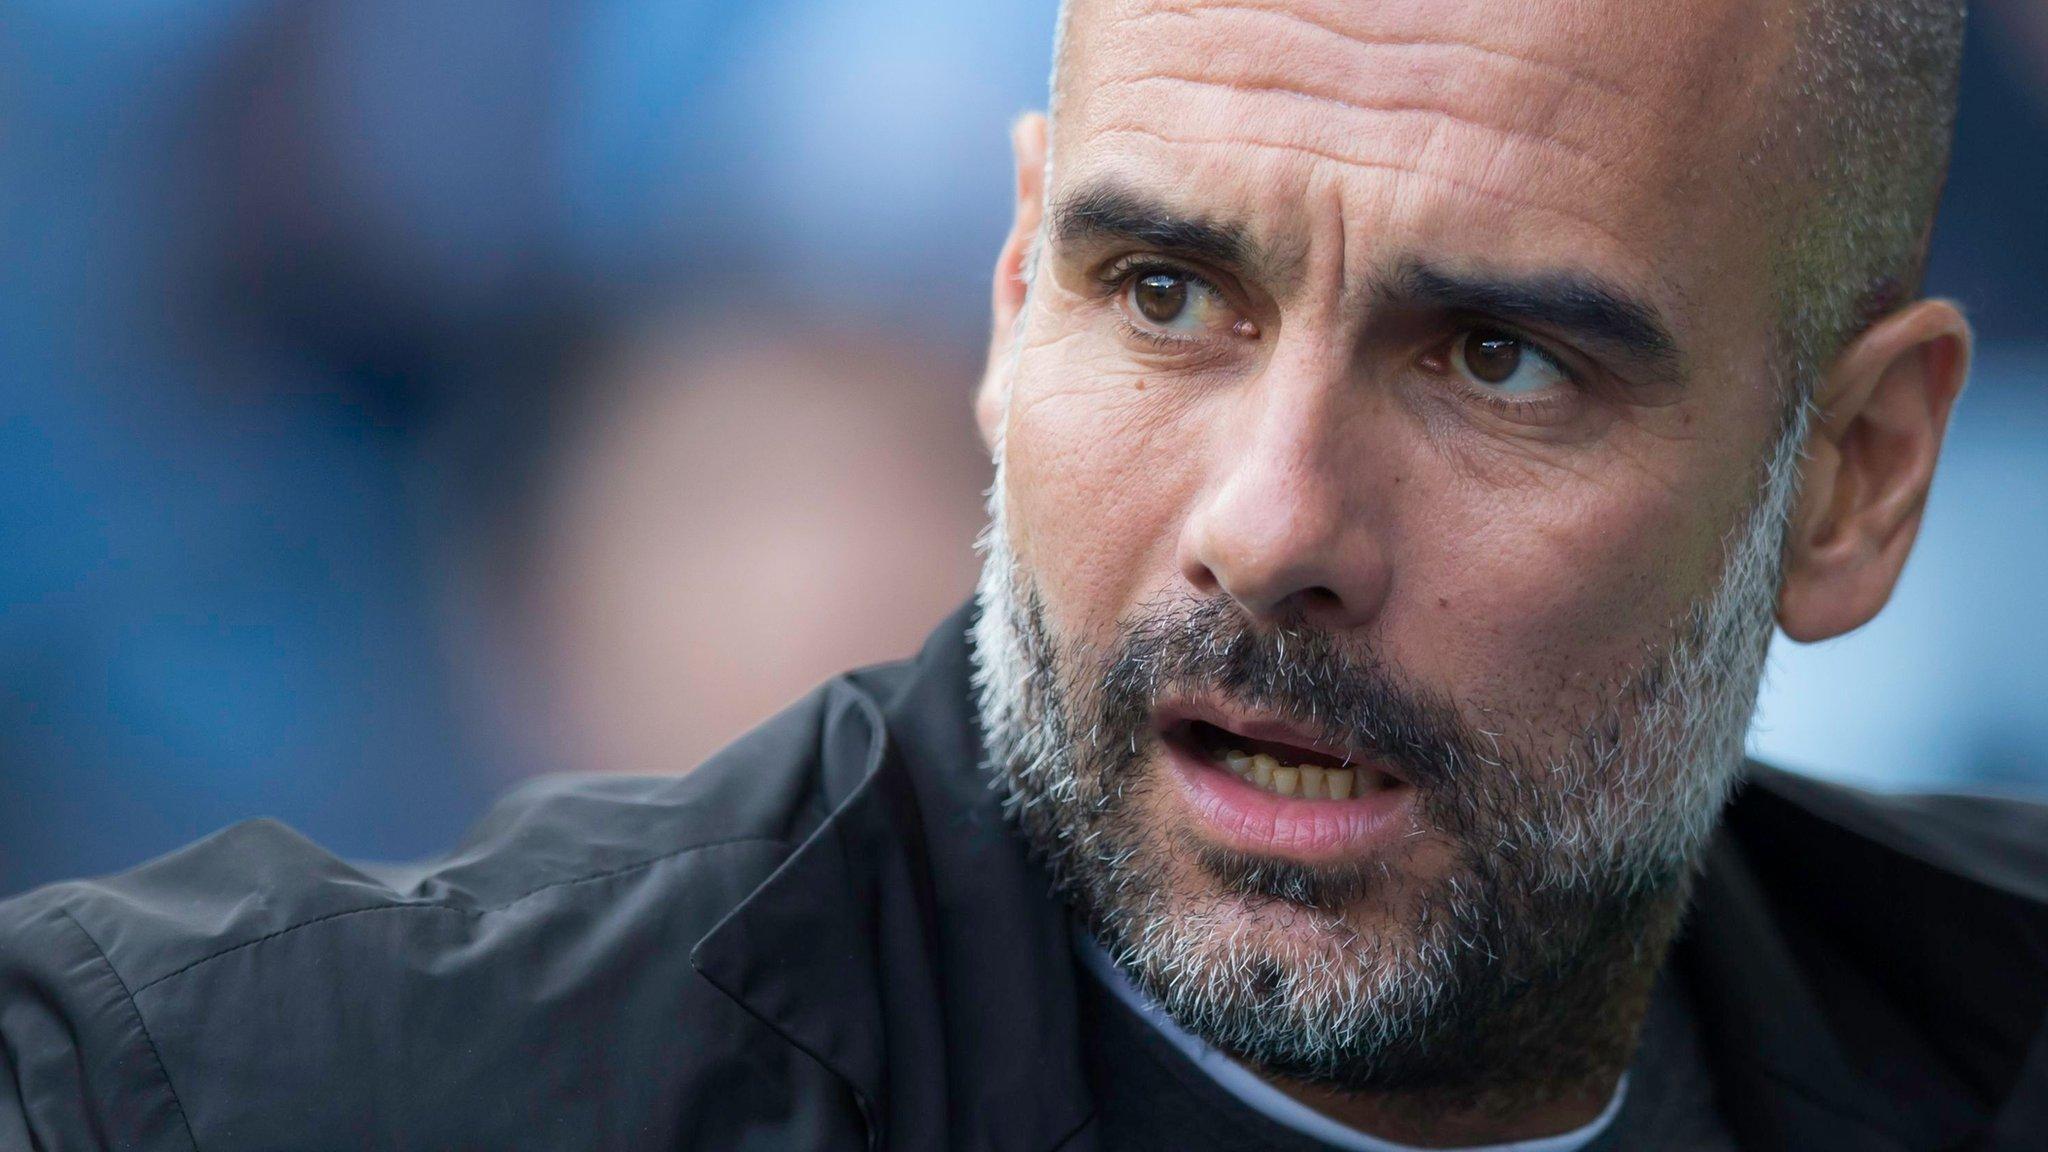 Man City don't feel ready to win Champions League - Guardiola